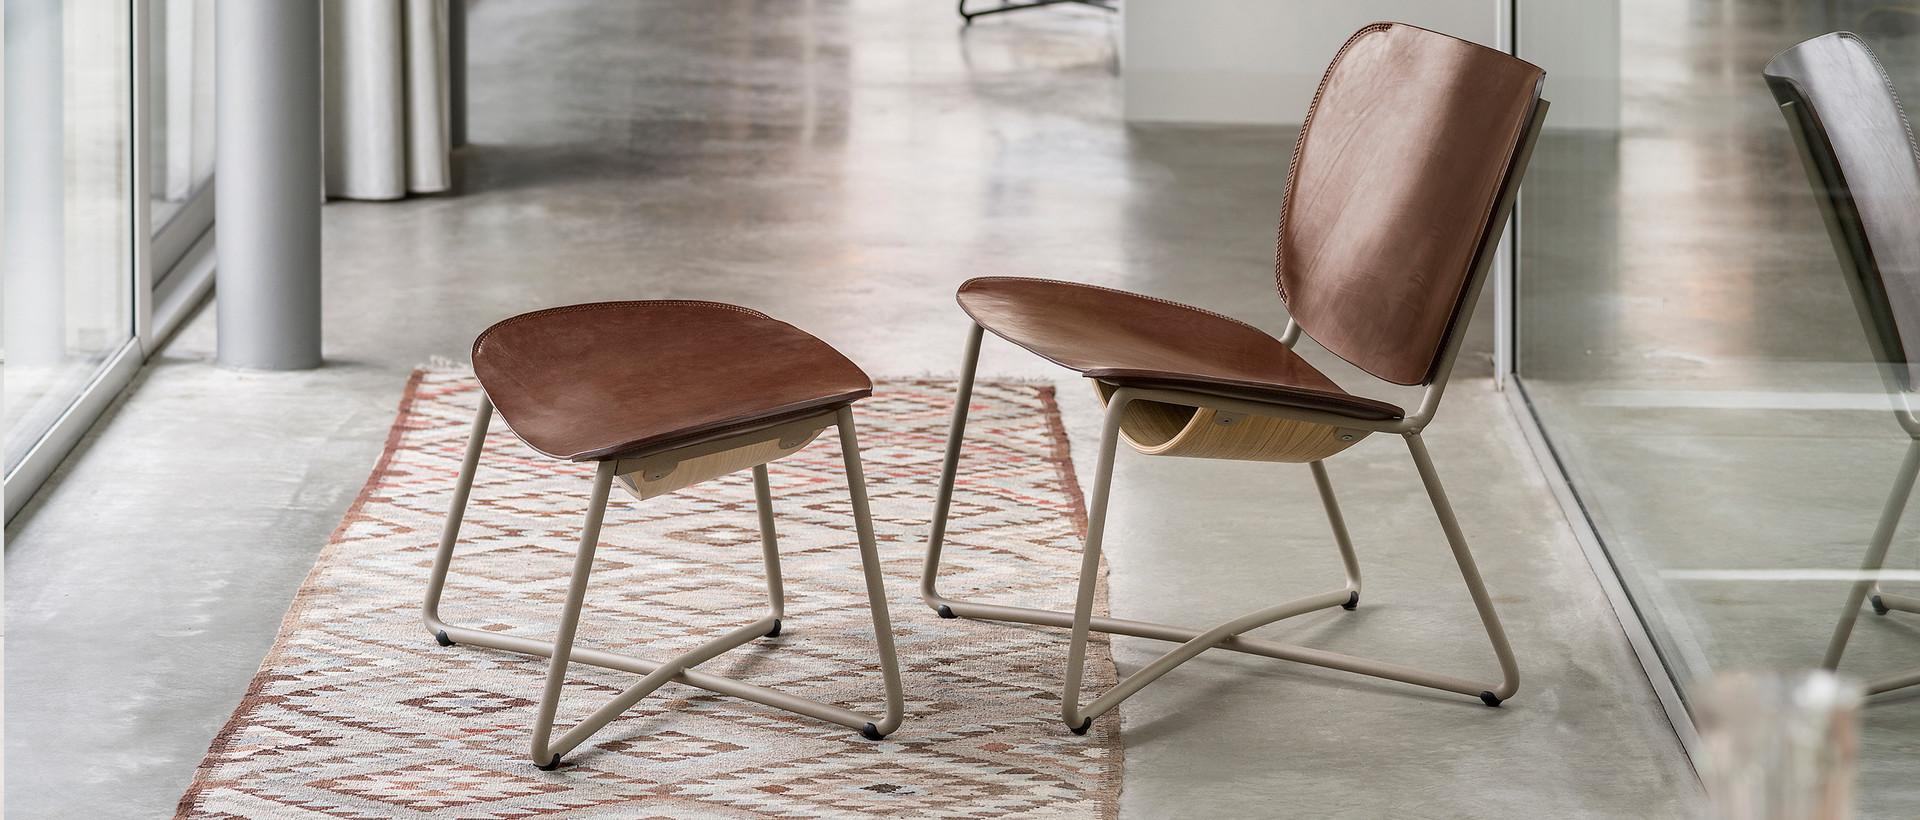 Loungestühle & Loungesessel